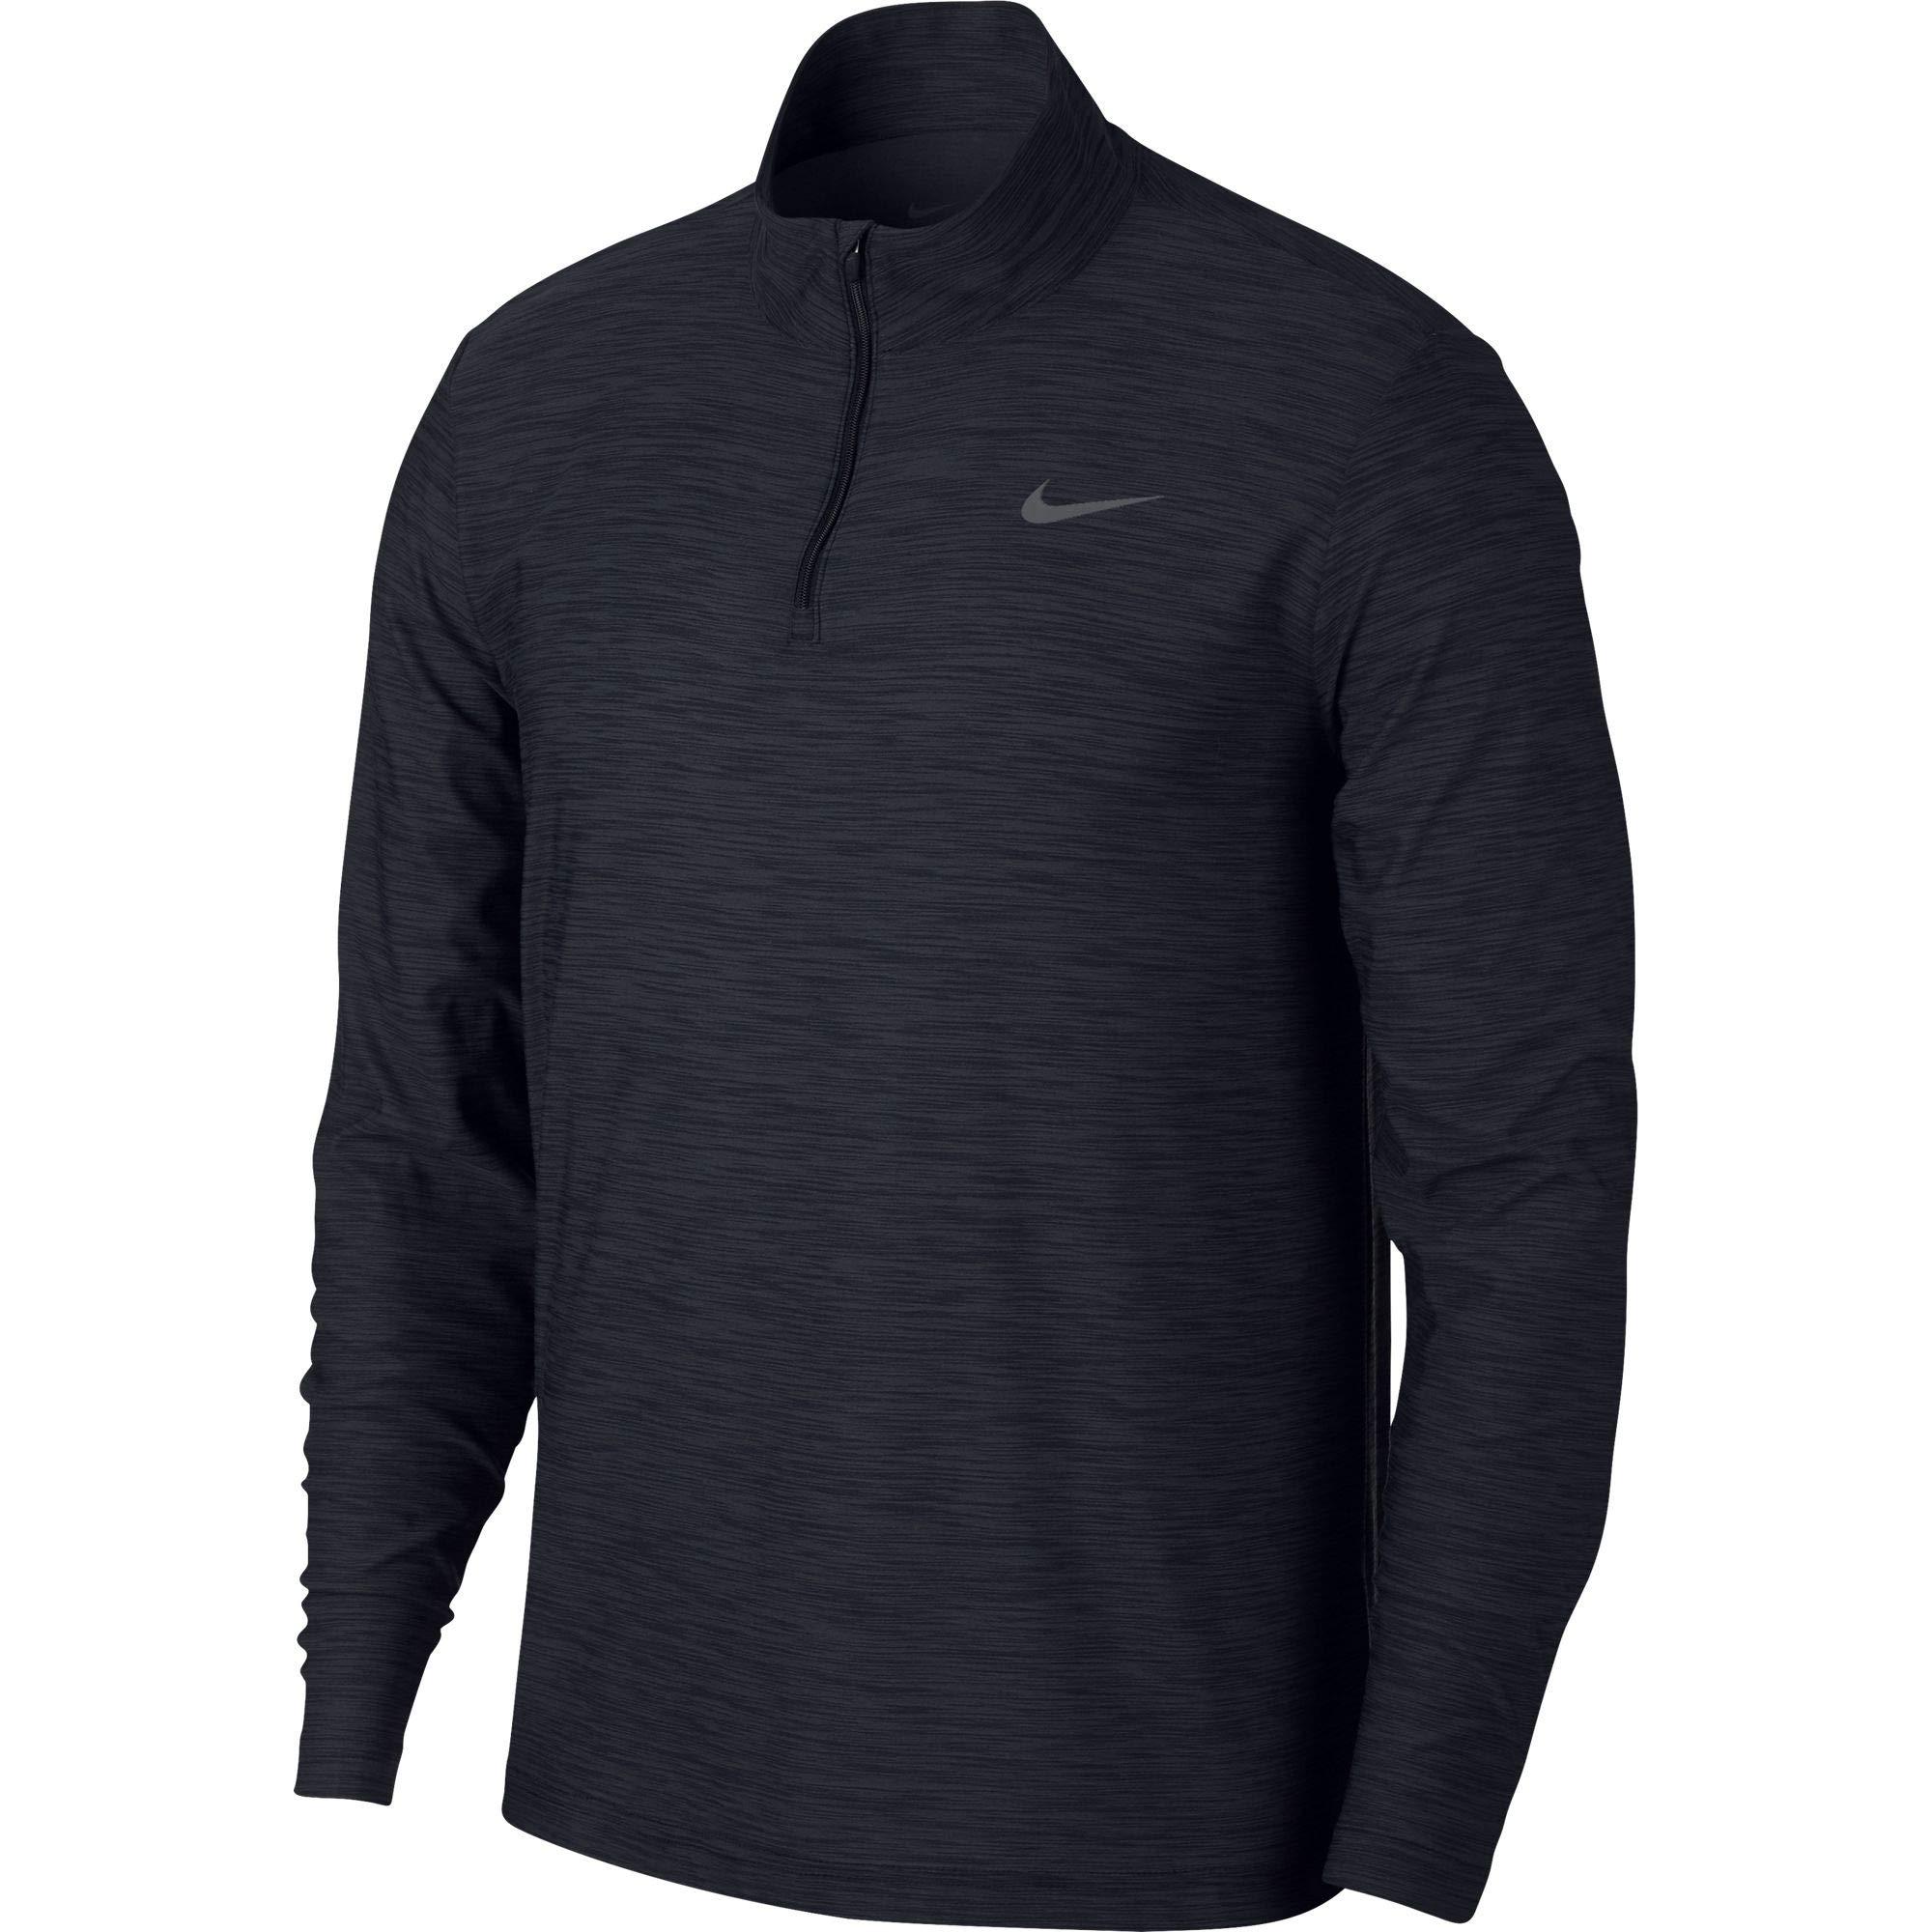 24daa278c Nike Men's Size MEDIUM Breathe Dri-fit Short Sleeve Running Shirt AA4858  037 NWT. $25.64. Nike Men's Breathe Dry Quarter Zip Long Sleeve Shirt, ...